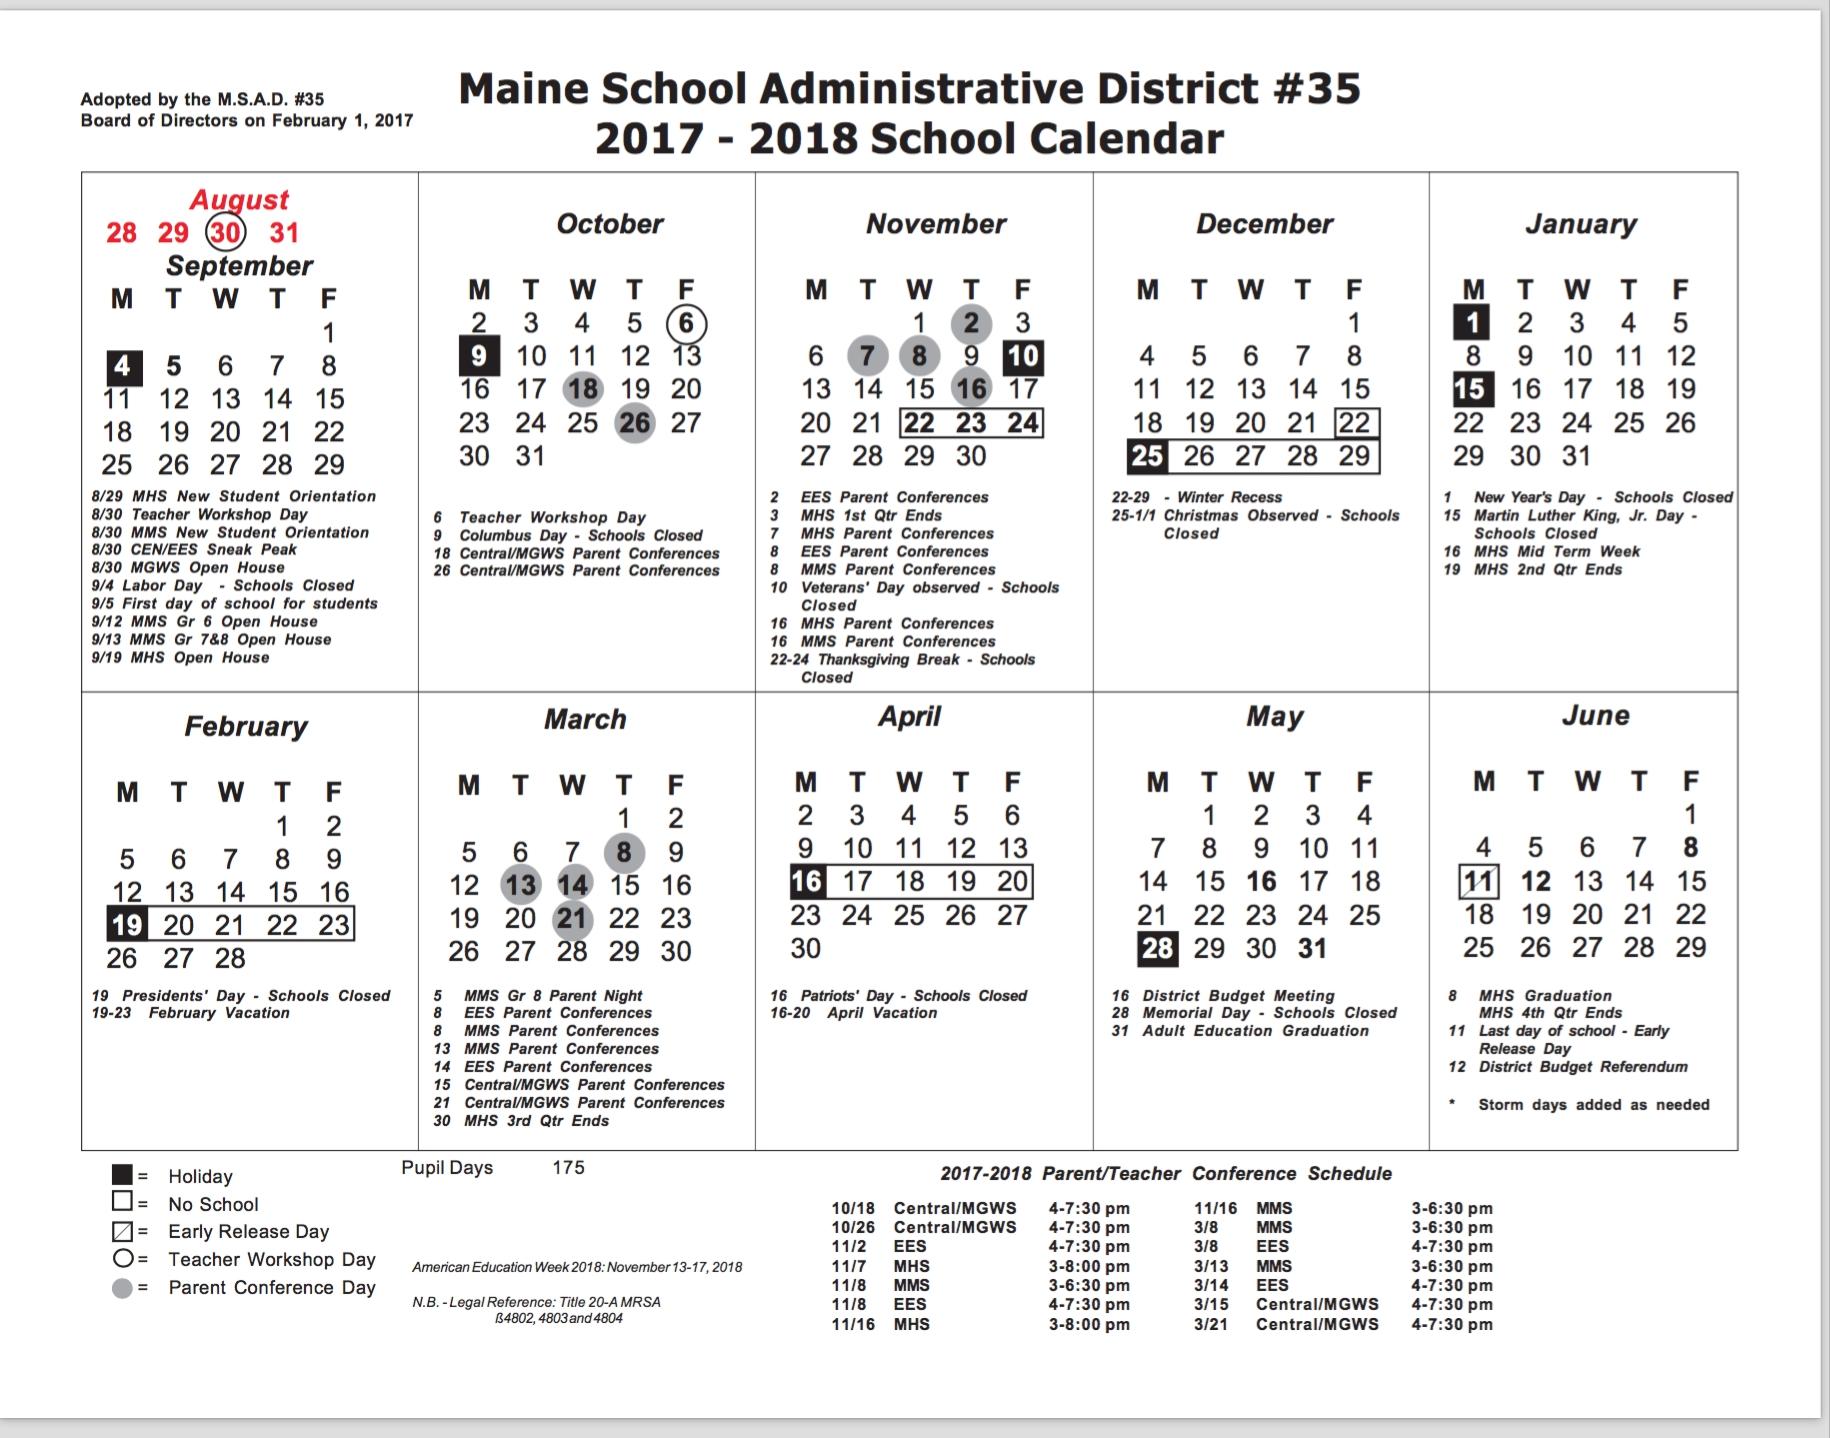 Updated School Calendar To Include The Change Of The Date Of The_Rsu 6 School Calendar